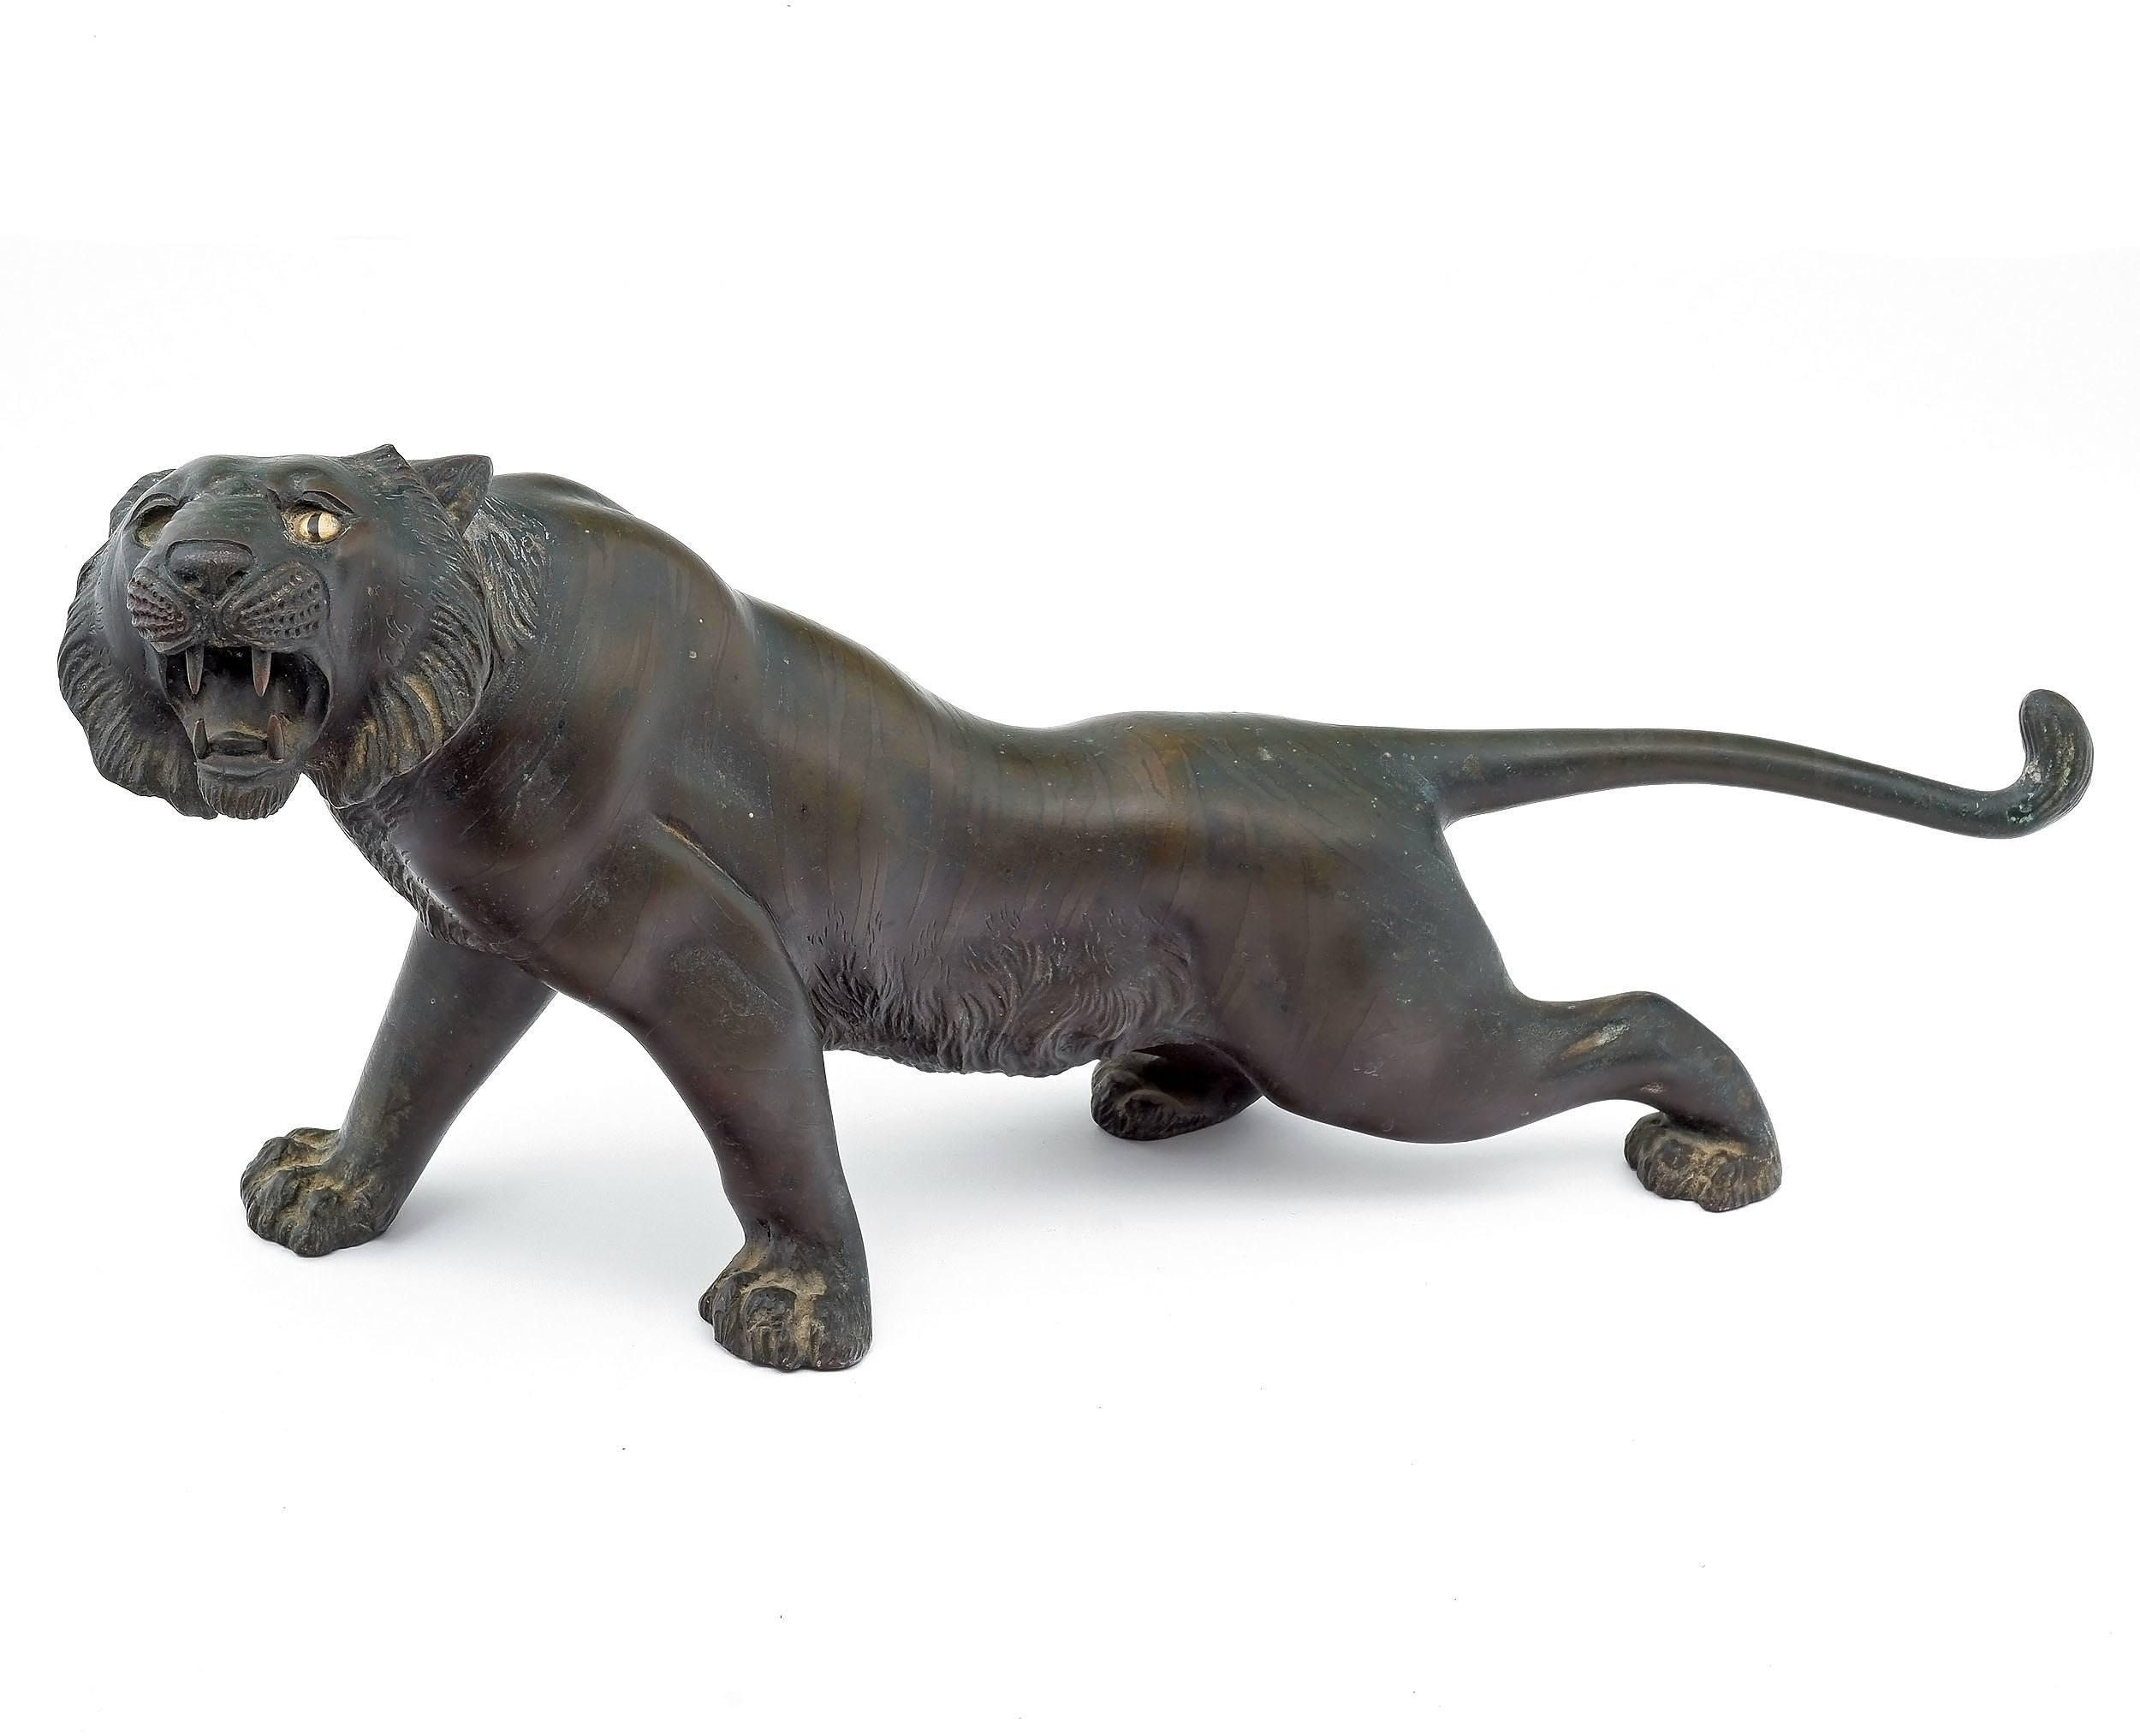 'Japanese Bronze Model of a Stalking Tiger, Meiji Period 1868-1912'